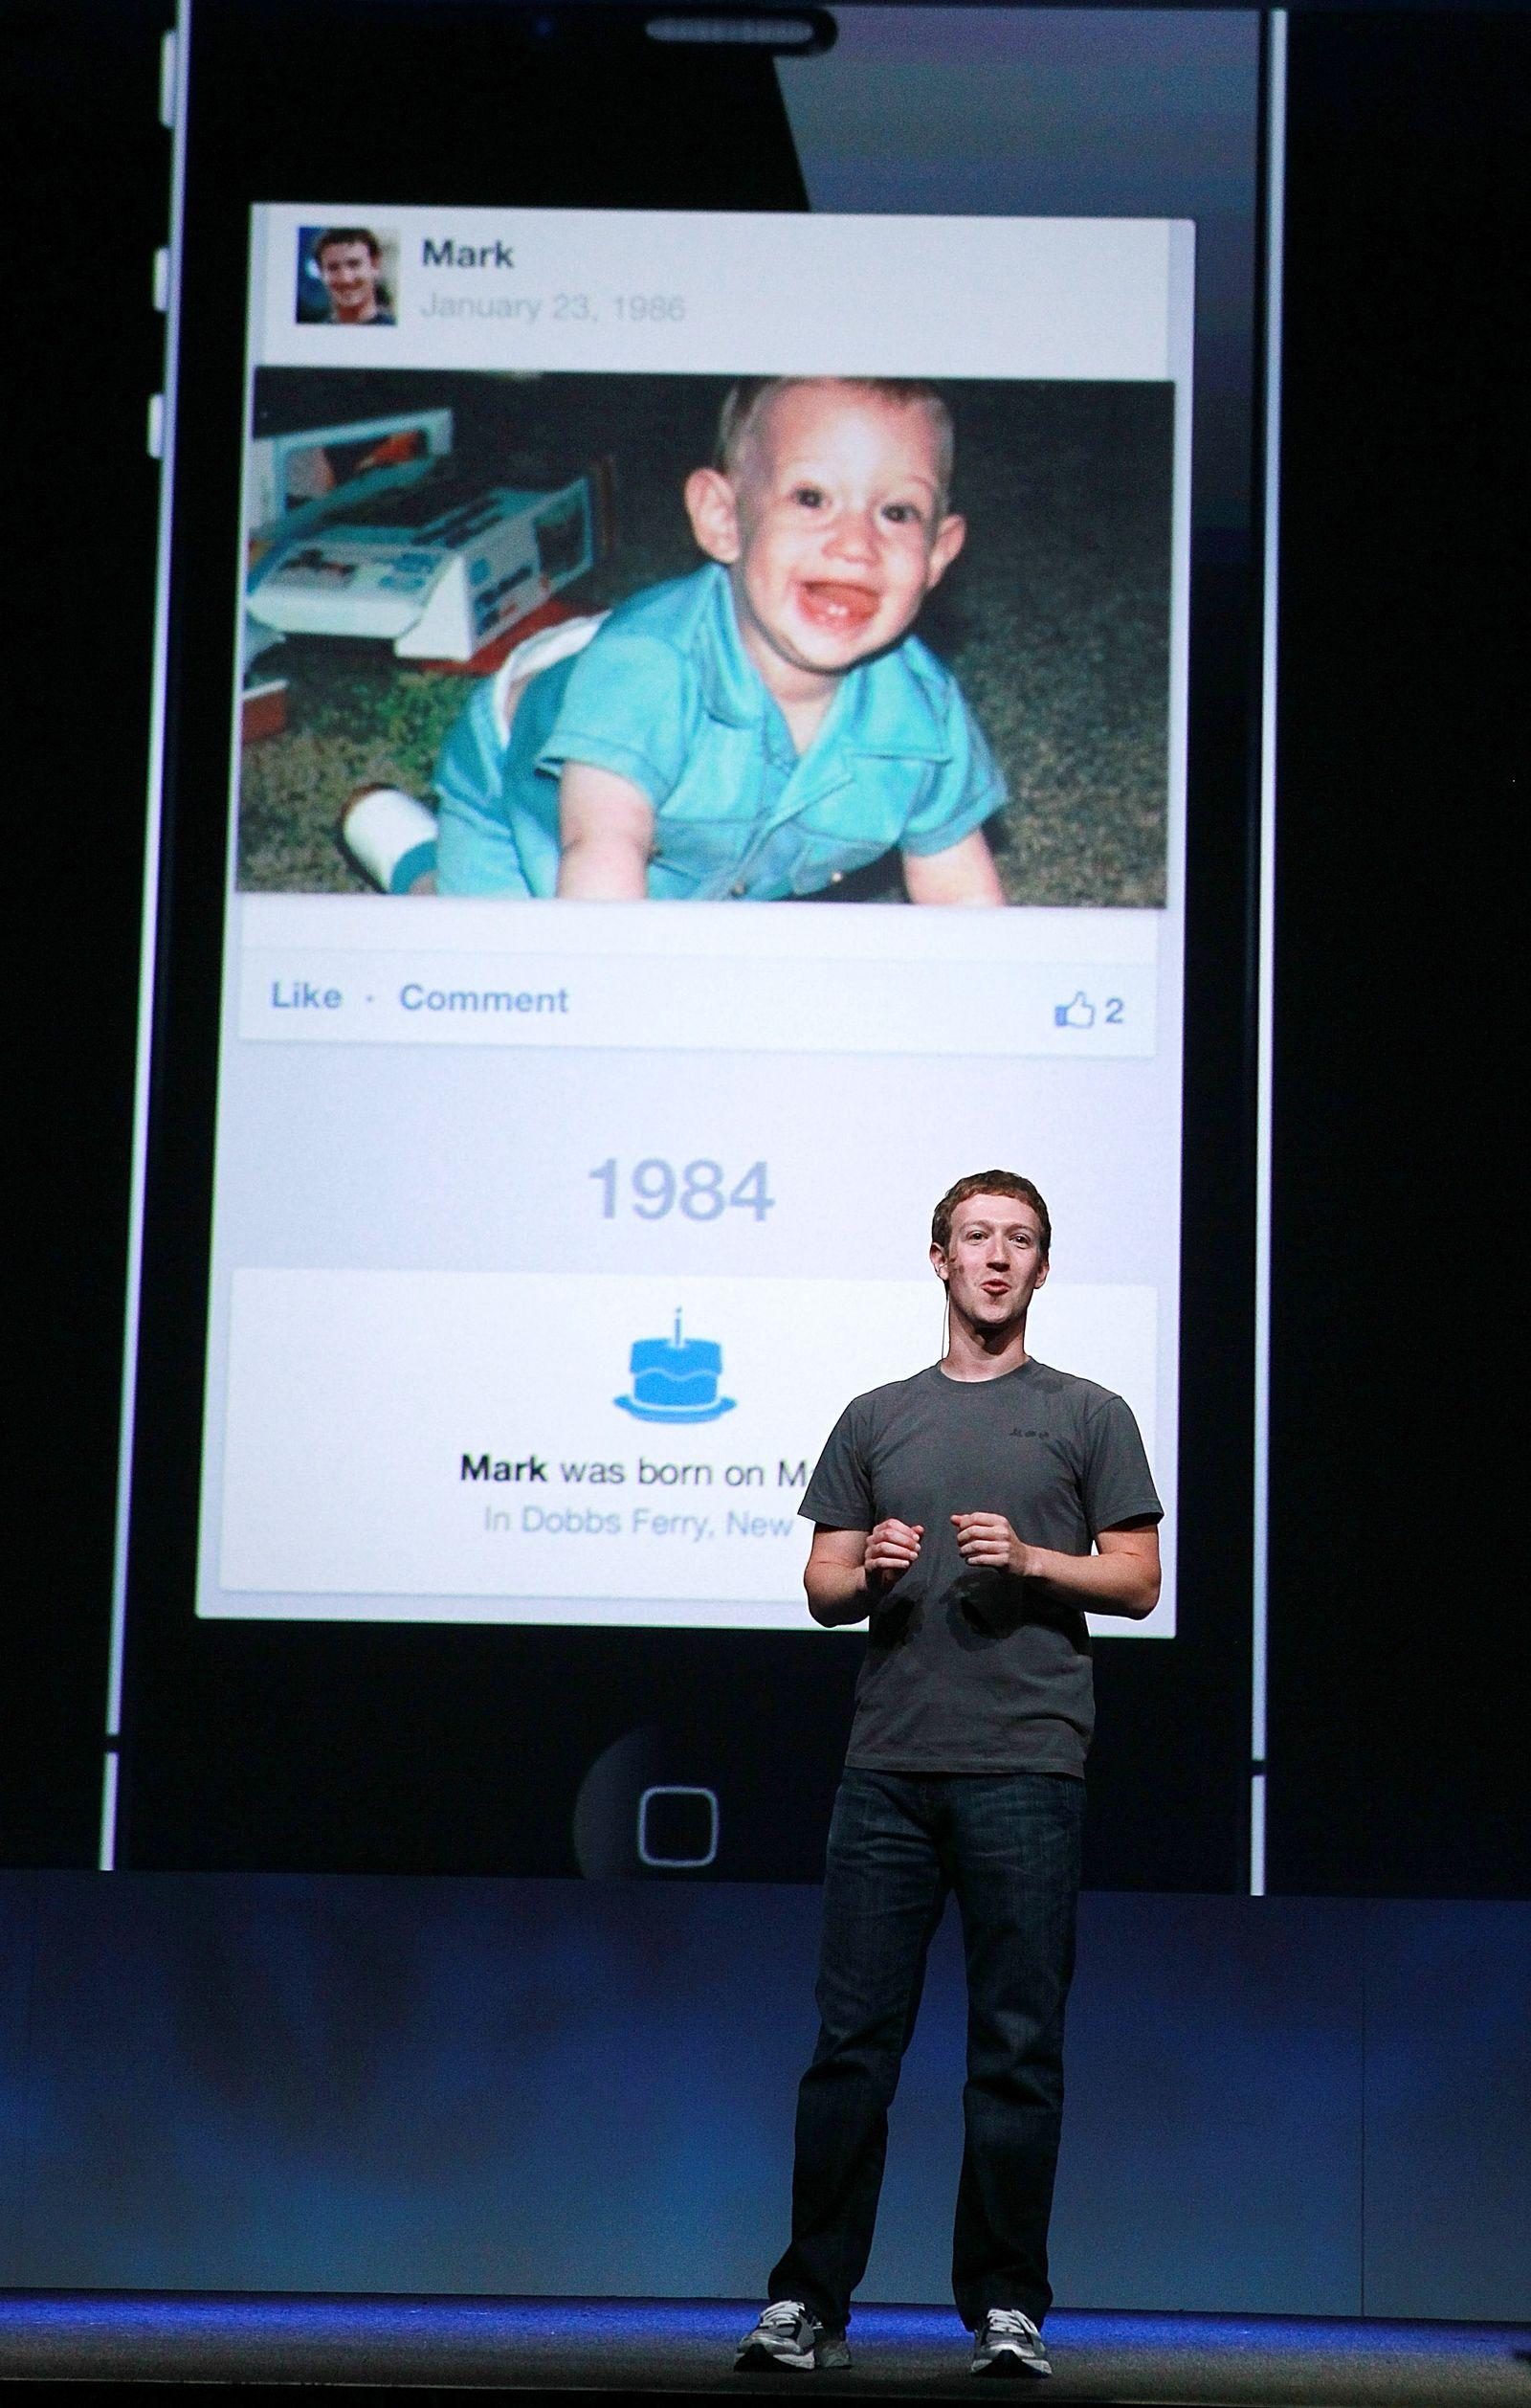 Zuckerberg/F8/Facebook/Timeline